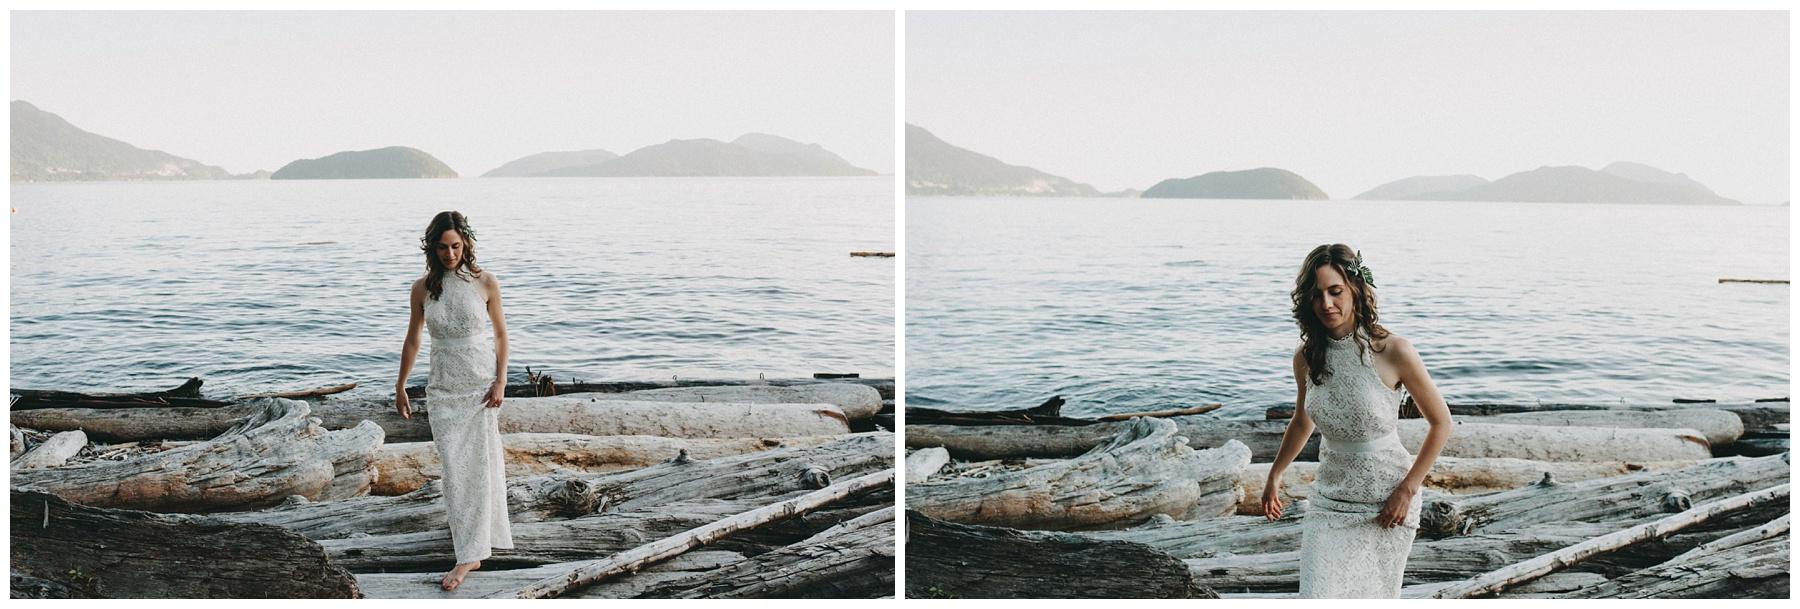 Vancouver intimate Wedding Photographer_0554.jpg